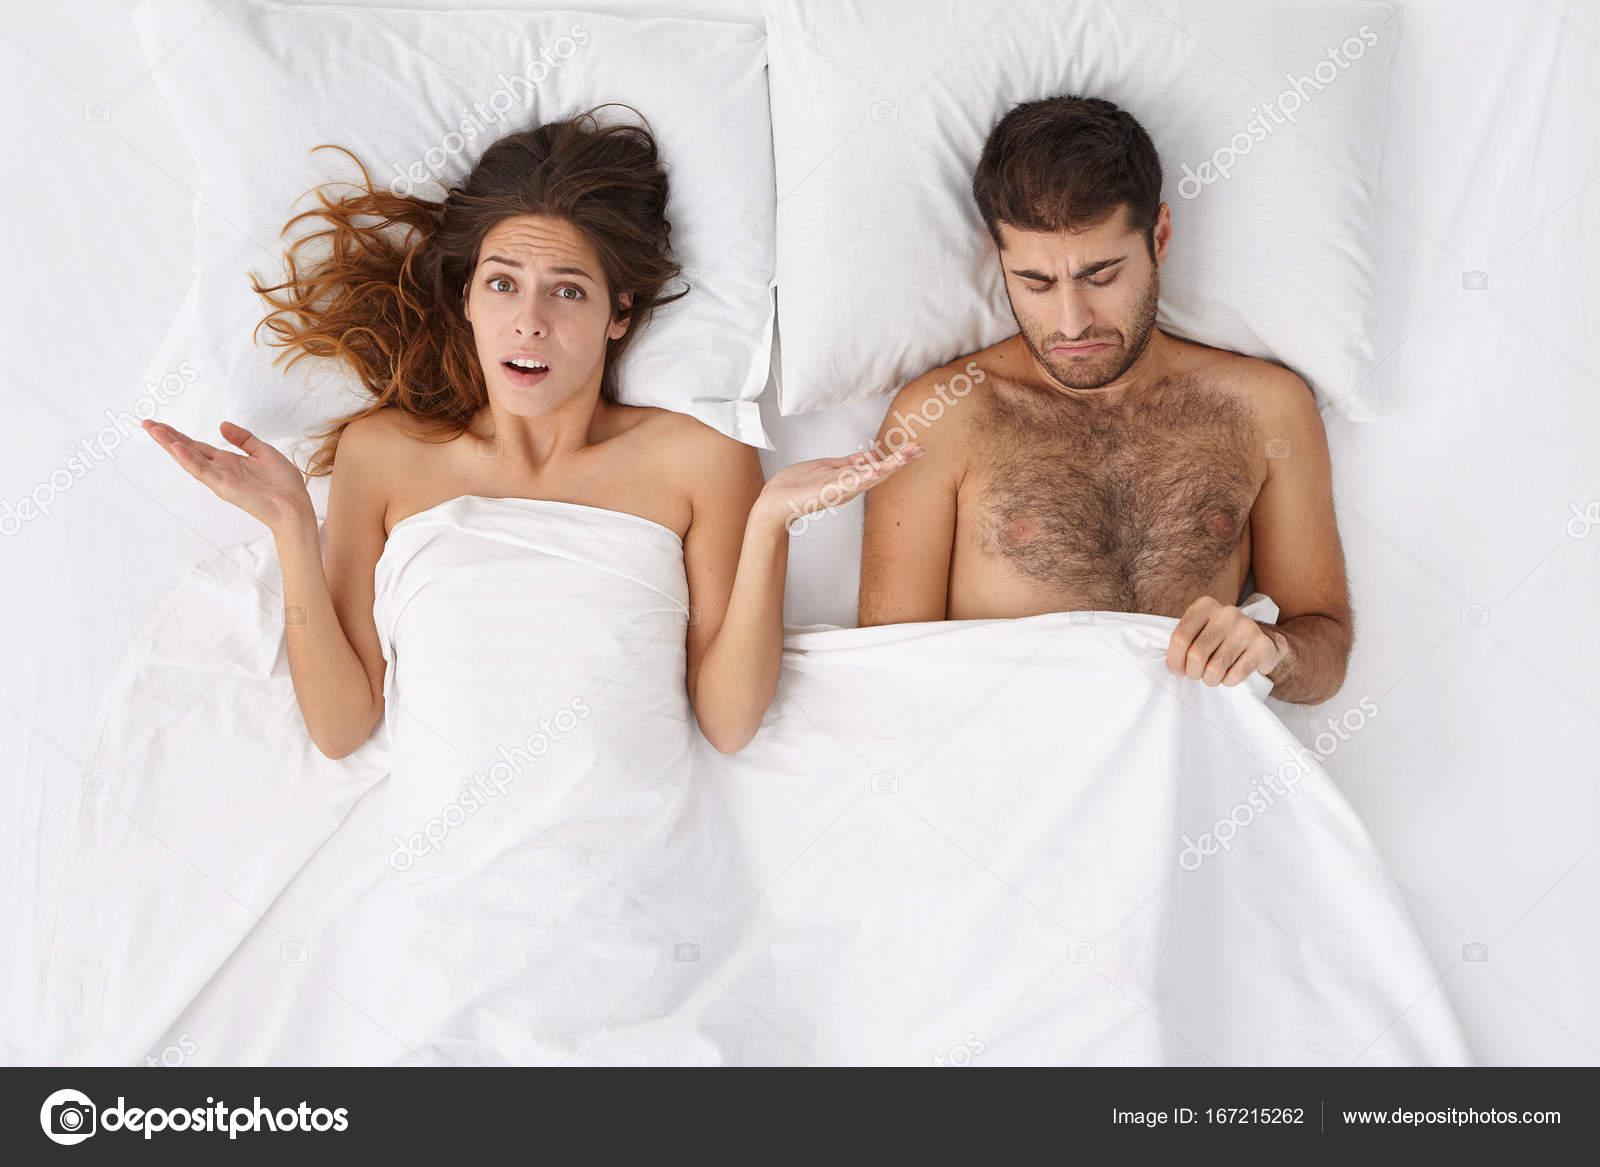 Ksw 20 pudzian vs piliafas online dating